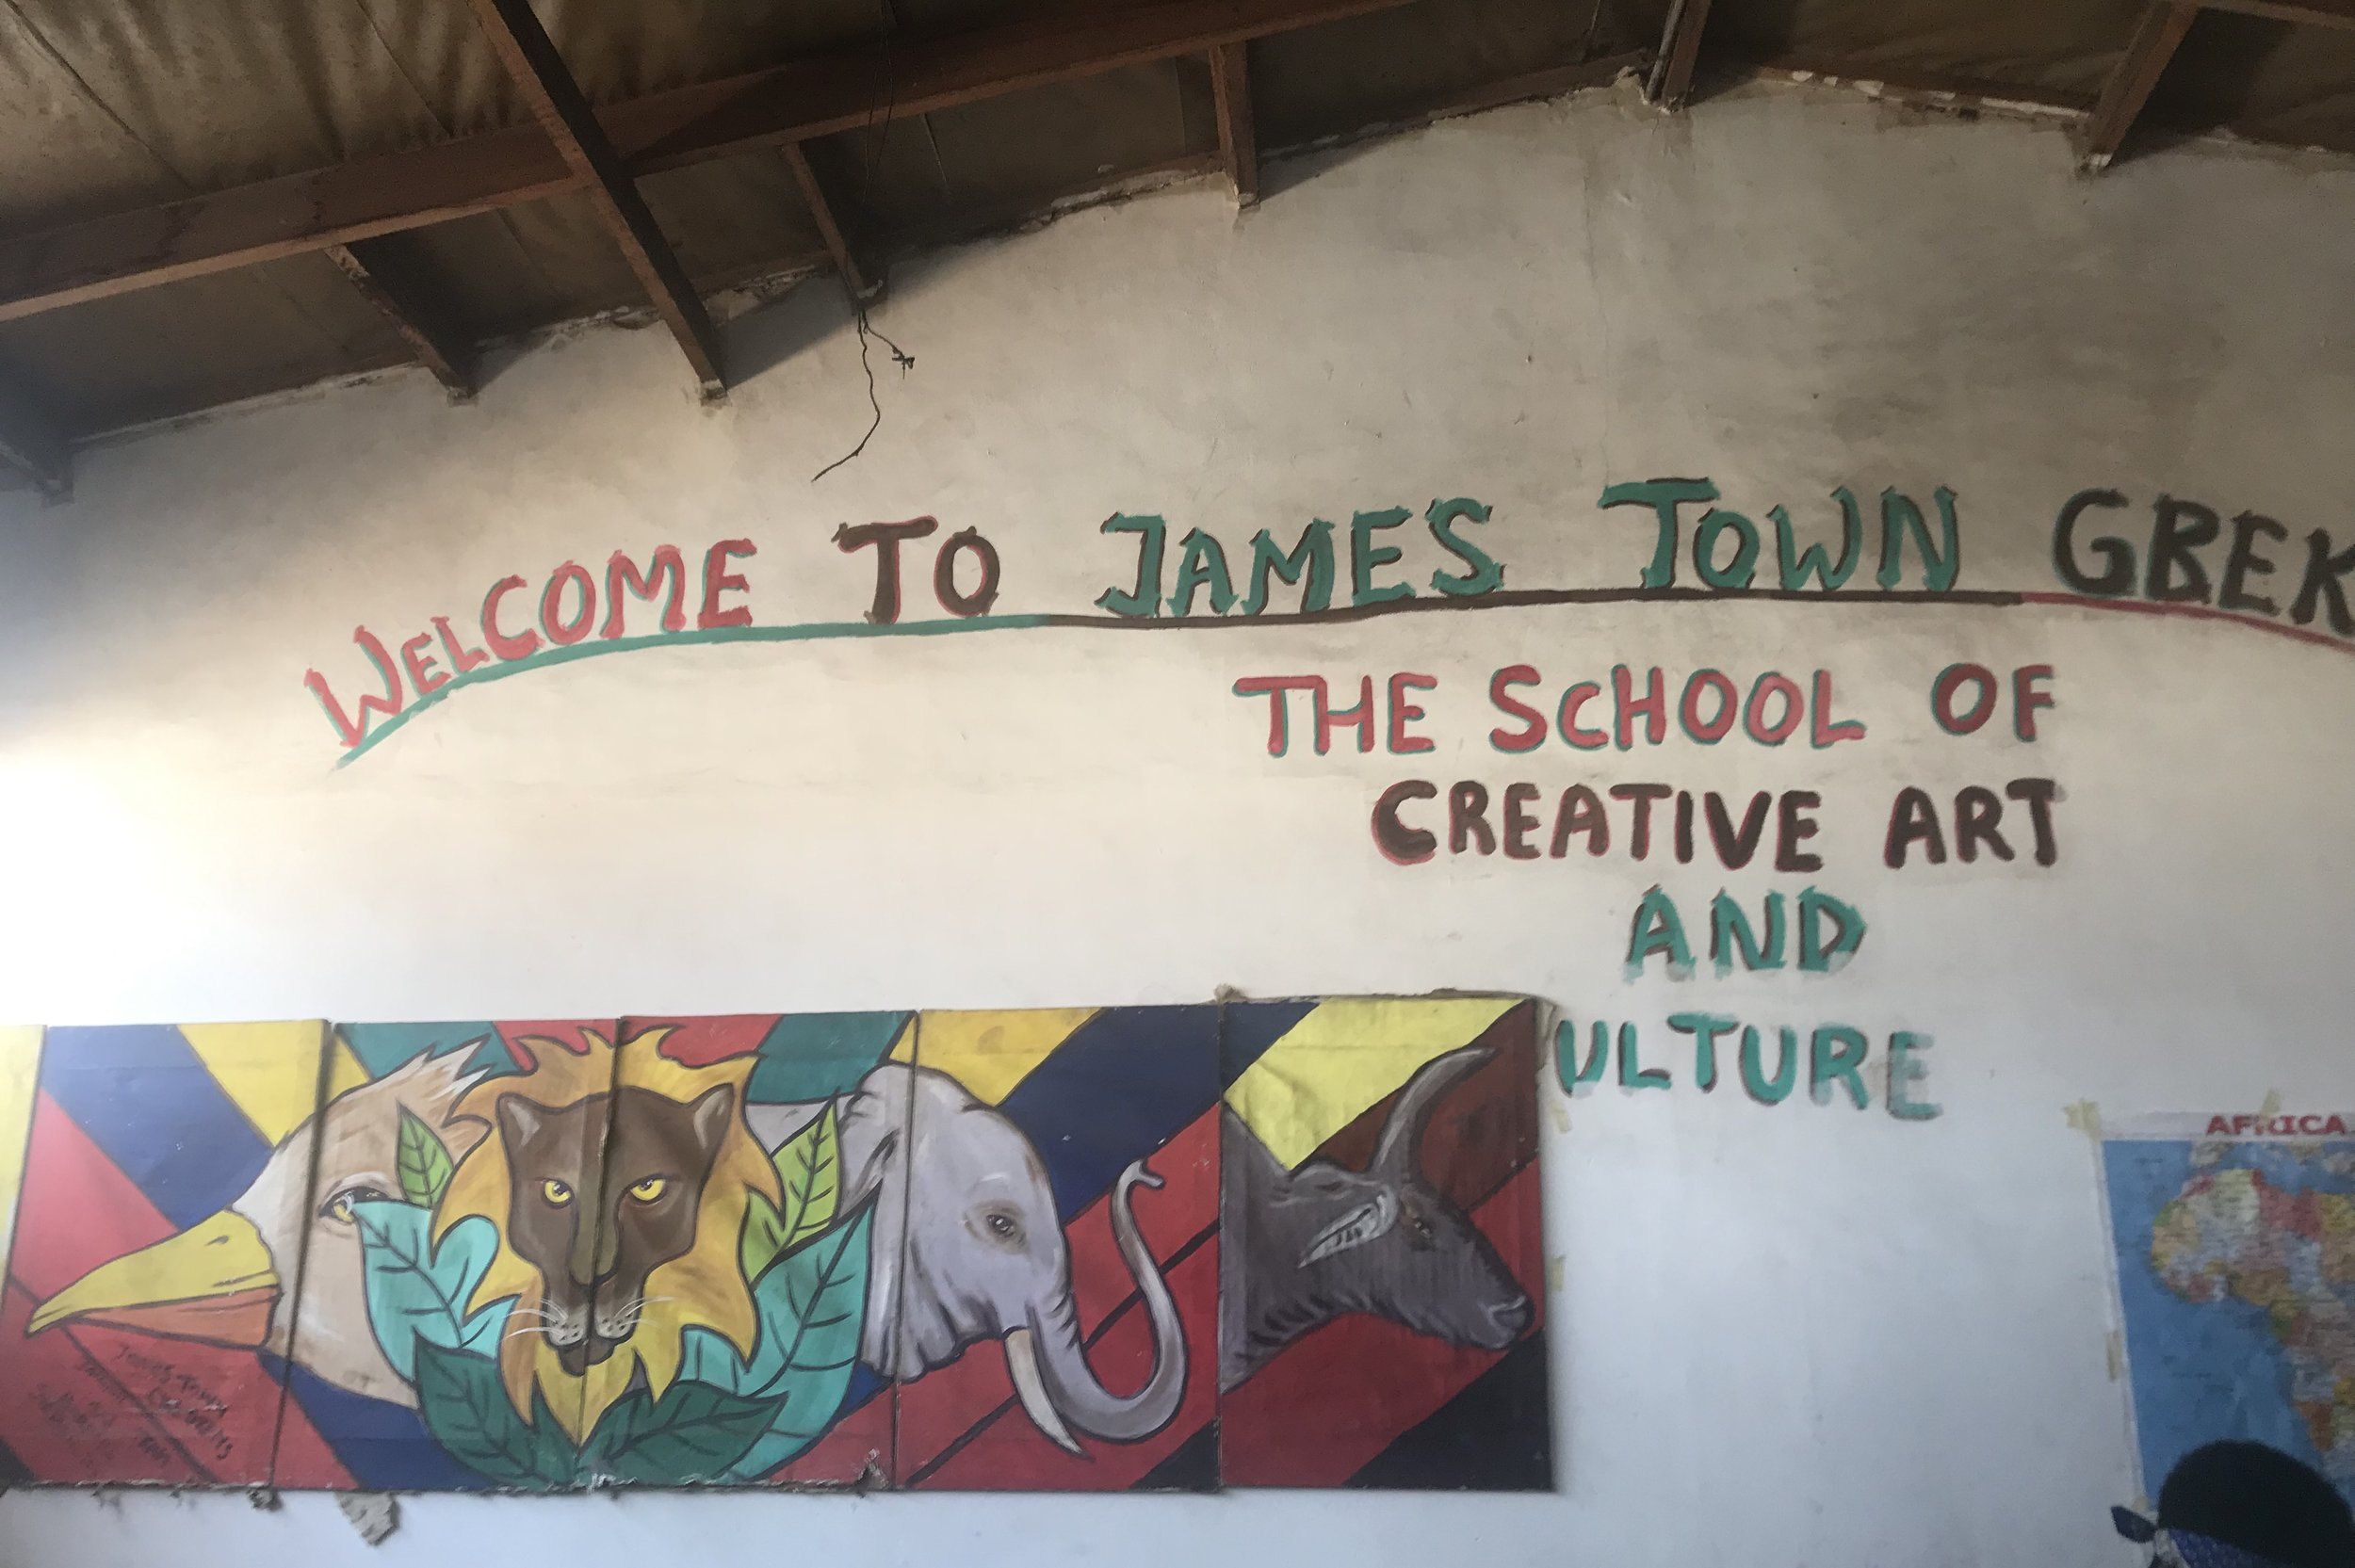 Jamestown fishing harbour – Non-profit school